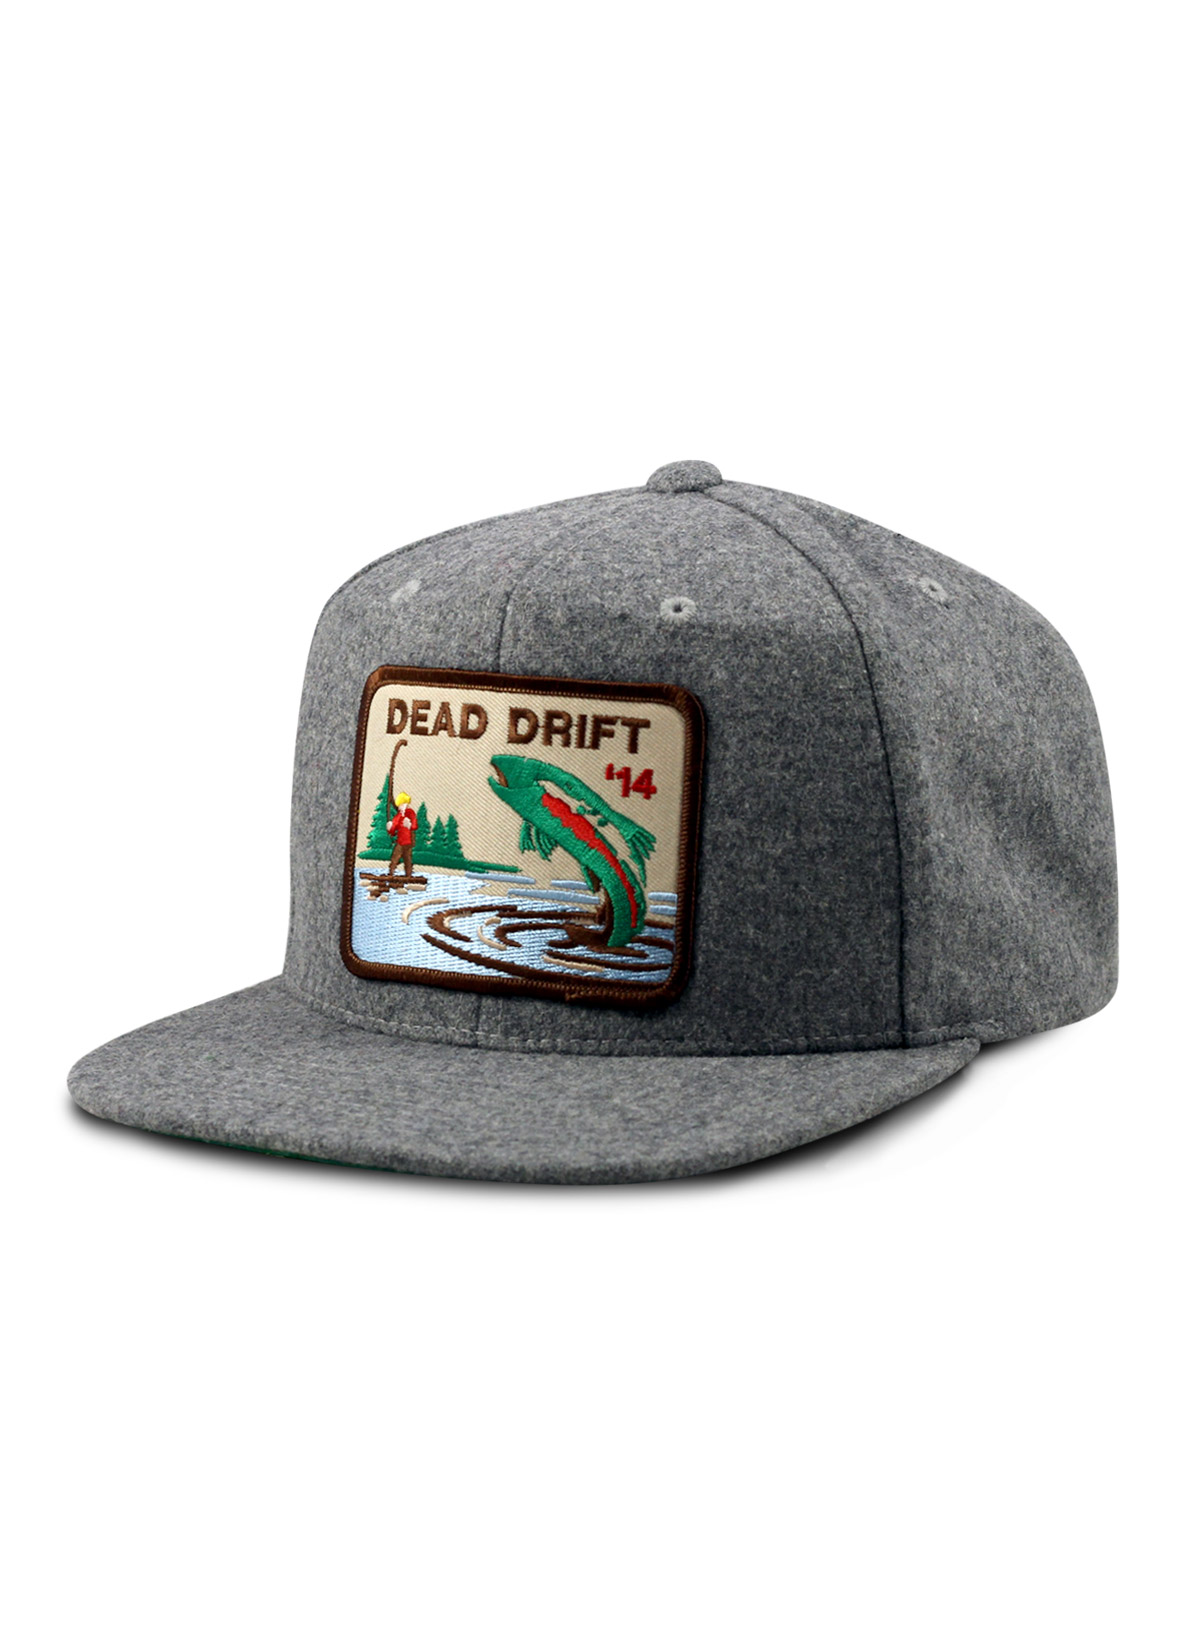 c534952eb91fc ... authentic dead drift fly fishing hats bow grey wool fc955 3dbcc